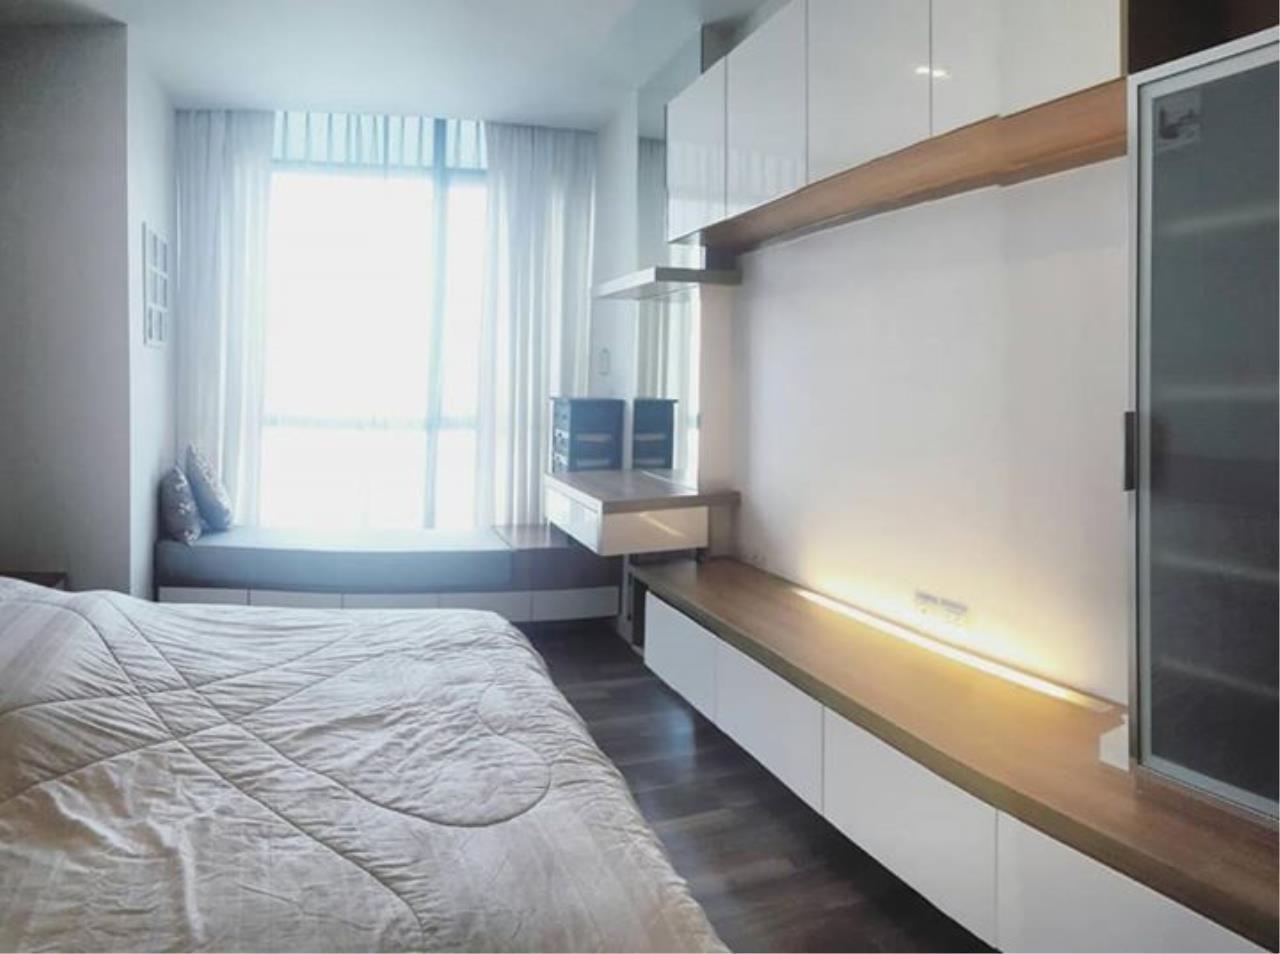 Quality Life Property Agency's S A L E & R E N T !! The Room Sukhumvit 62 1br 47 Sq.m. High Floor 6,550,000 Baht 7